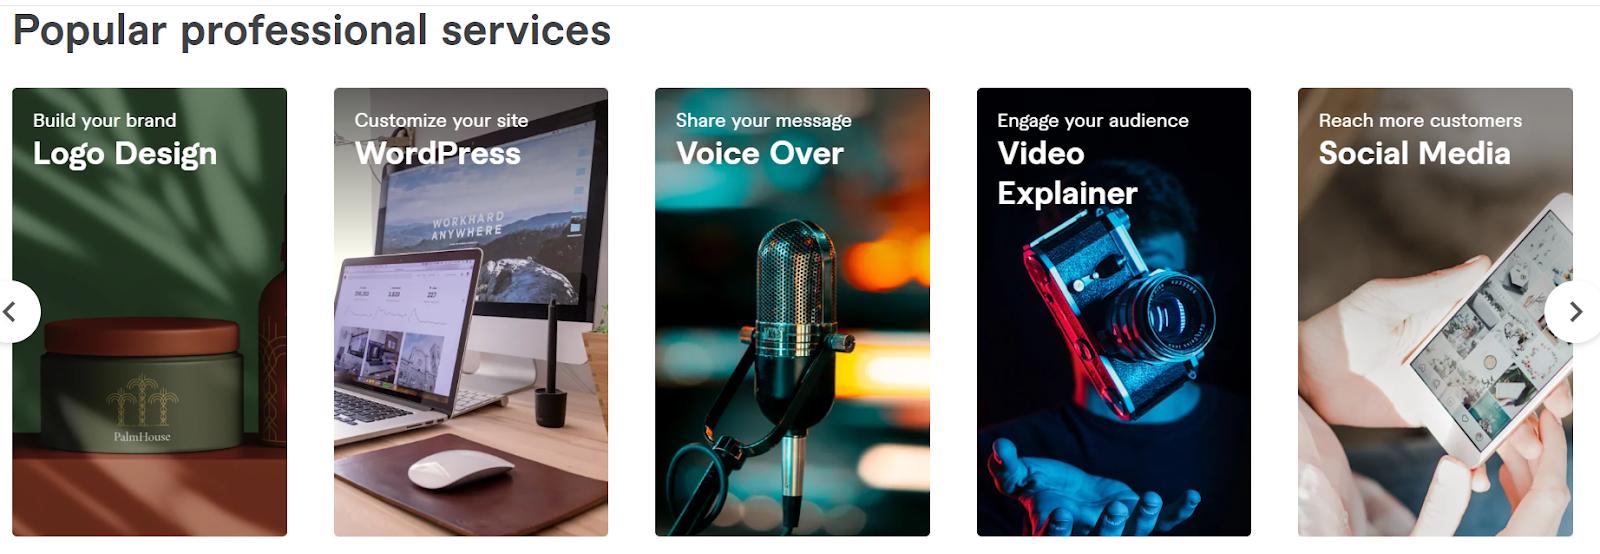 Fiverr's popular professional services.